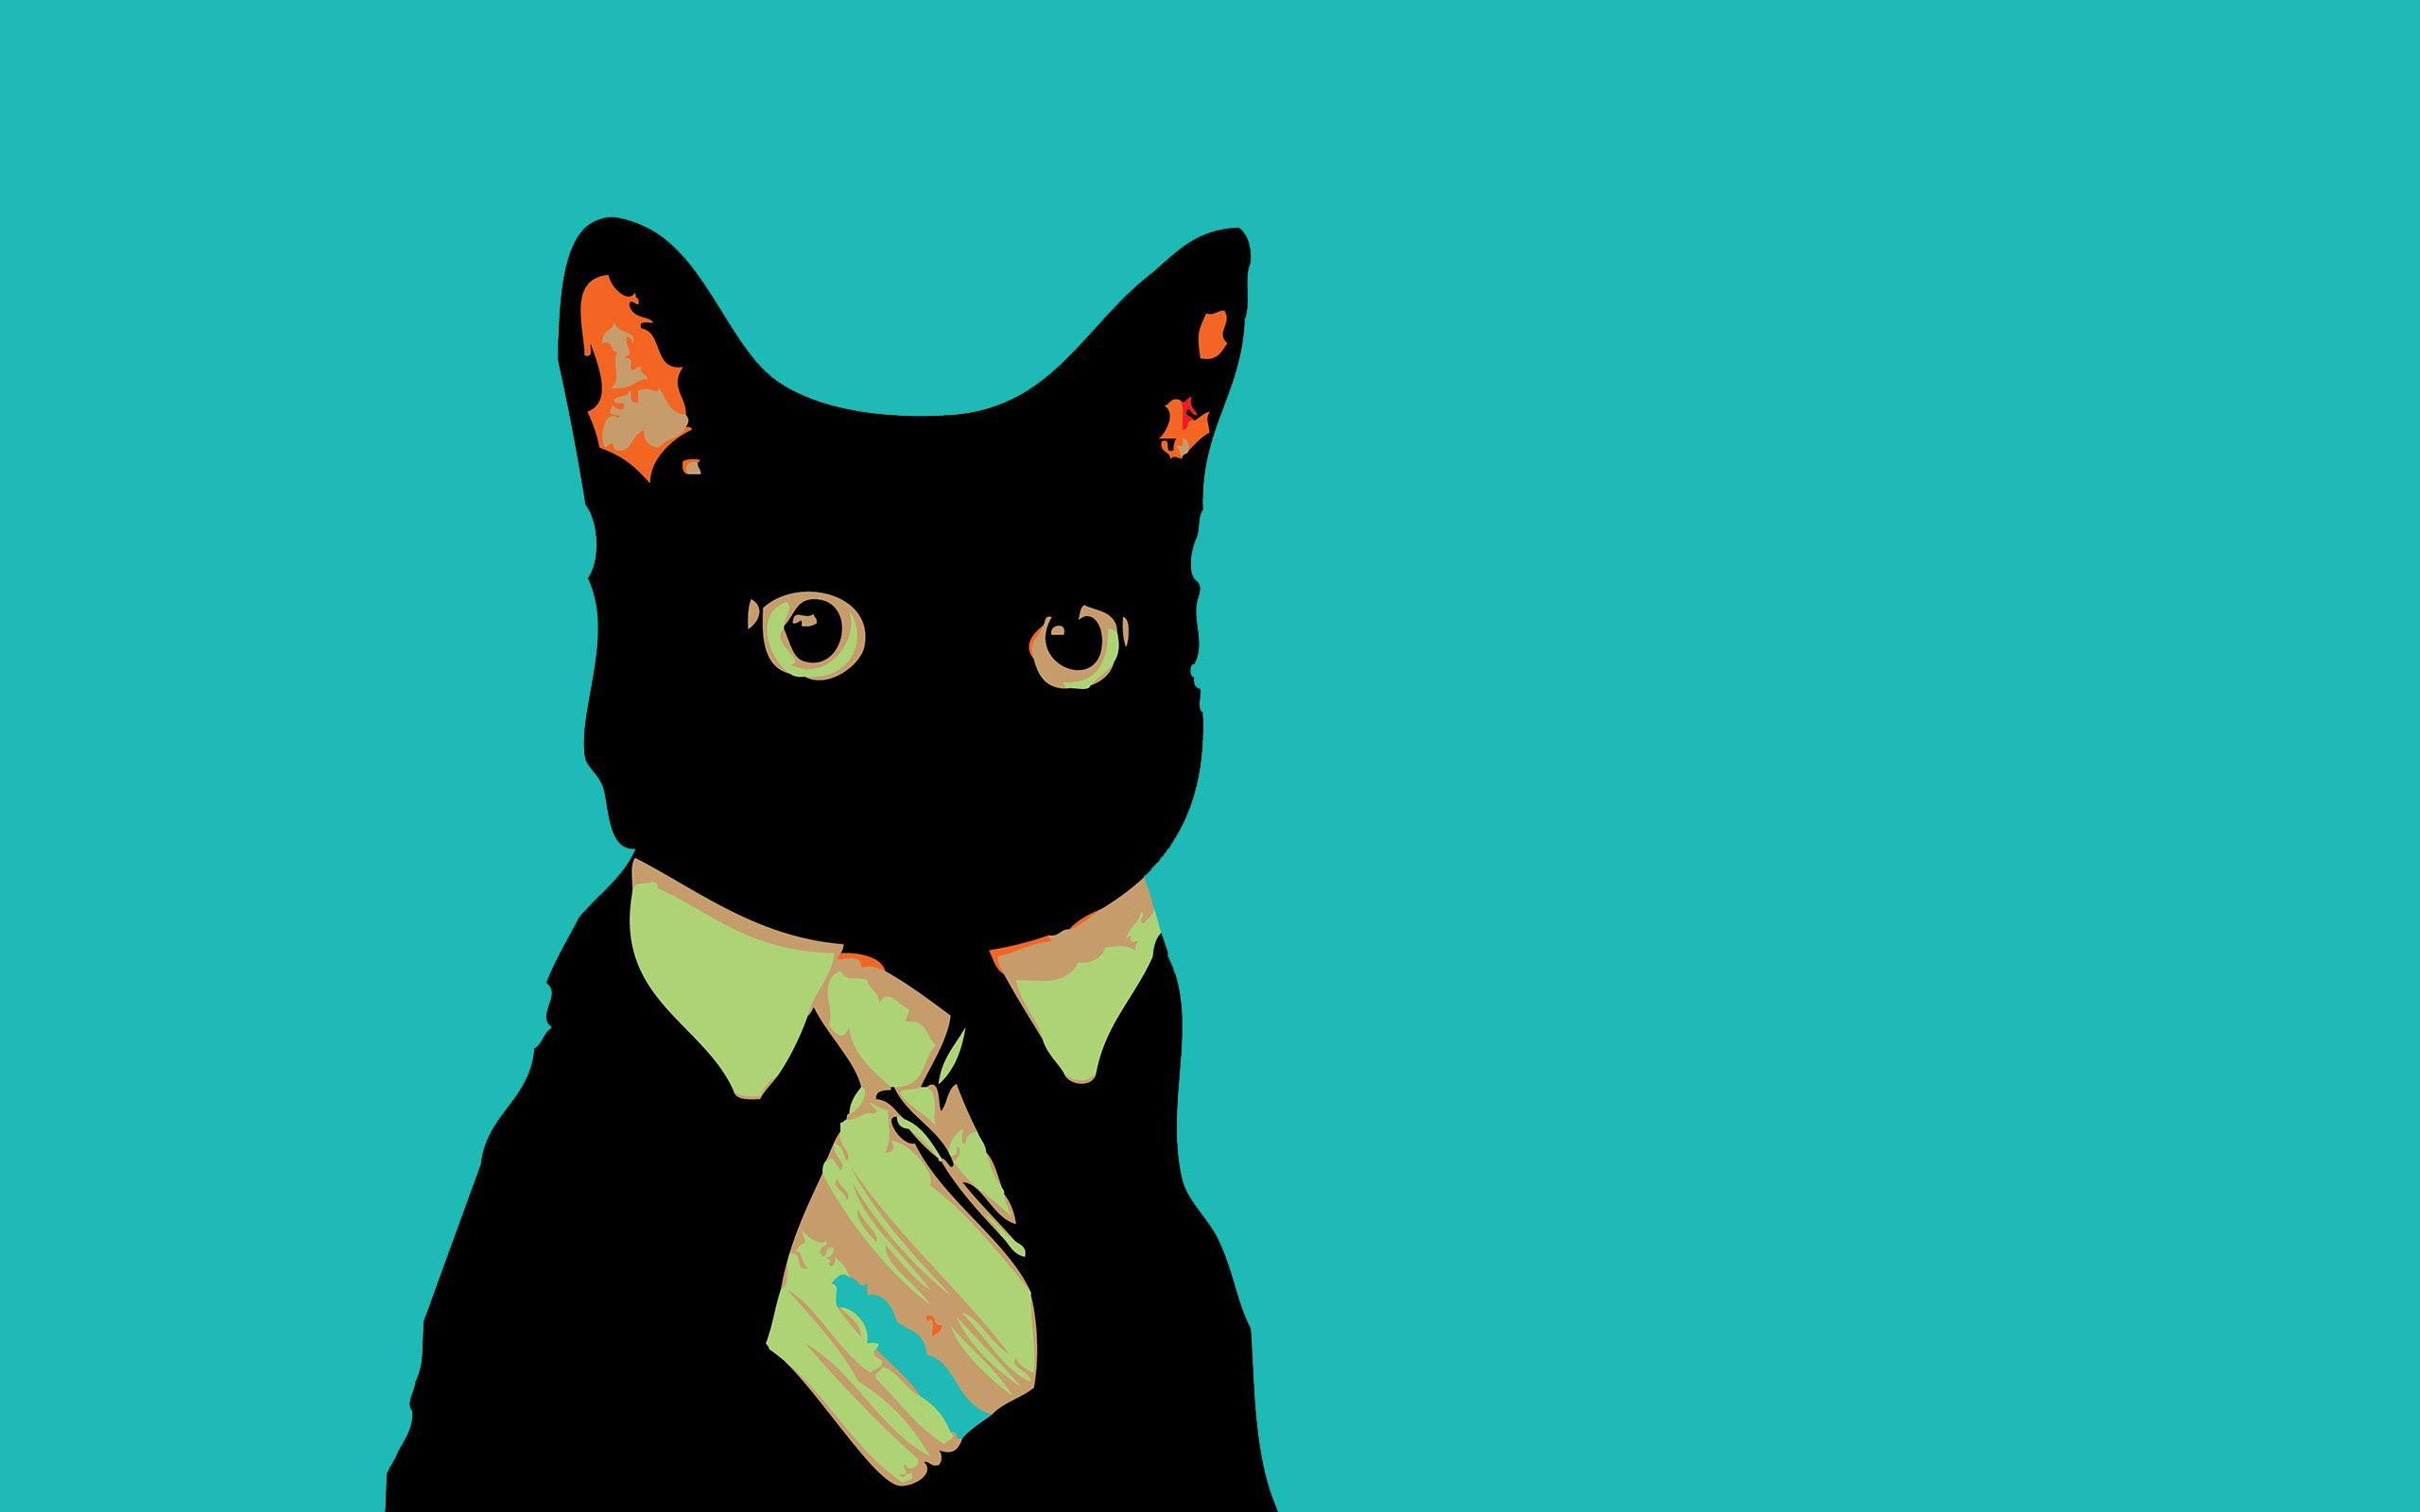 business-cat-meme-meme-hd-wallpaper-2560×1600-6867.